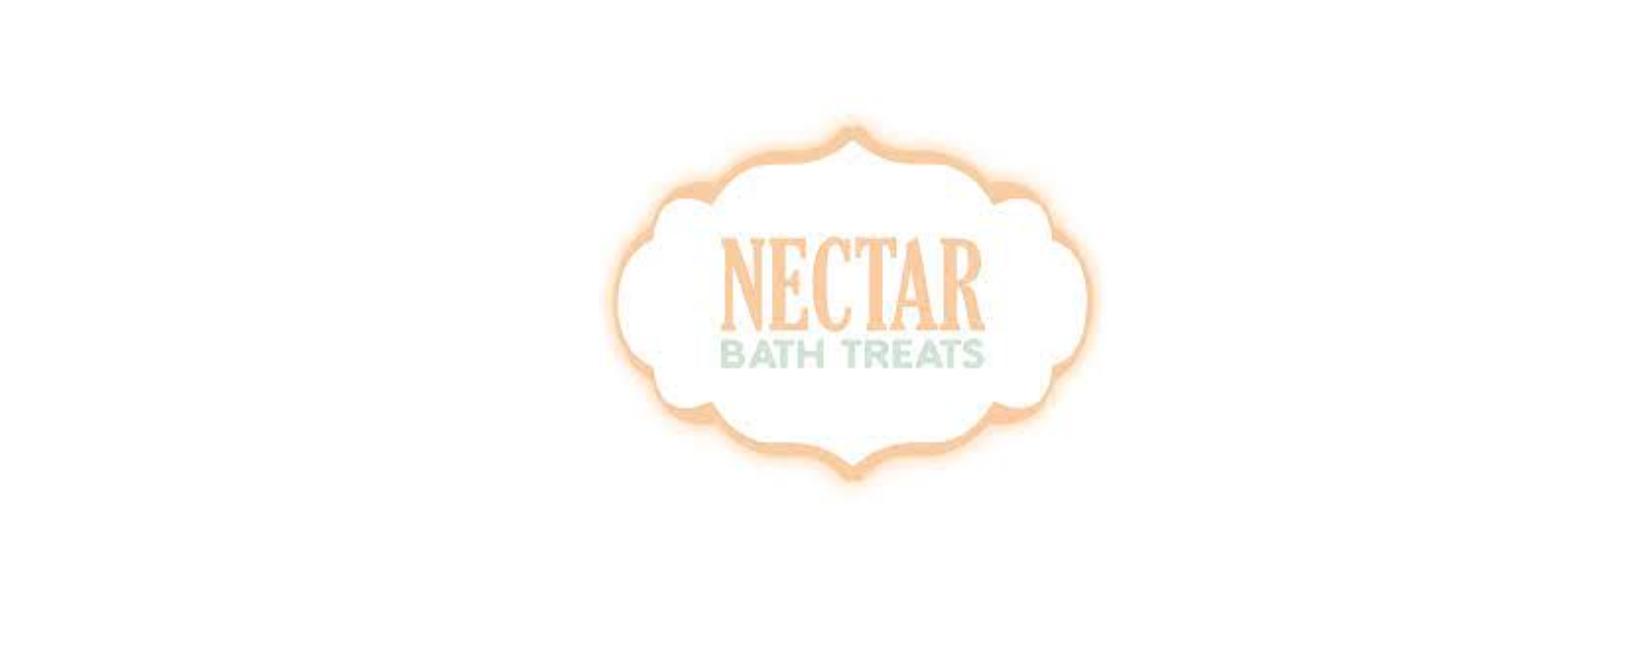 Nectar Bath Treats Discount Code 2021